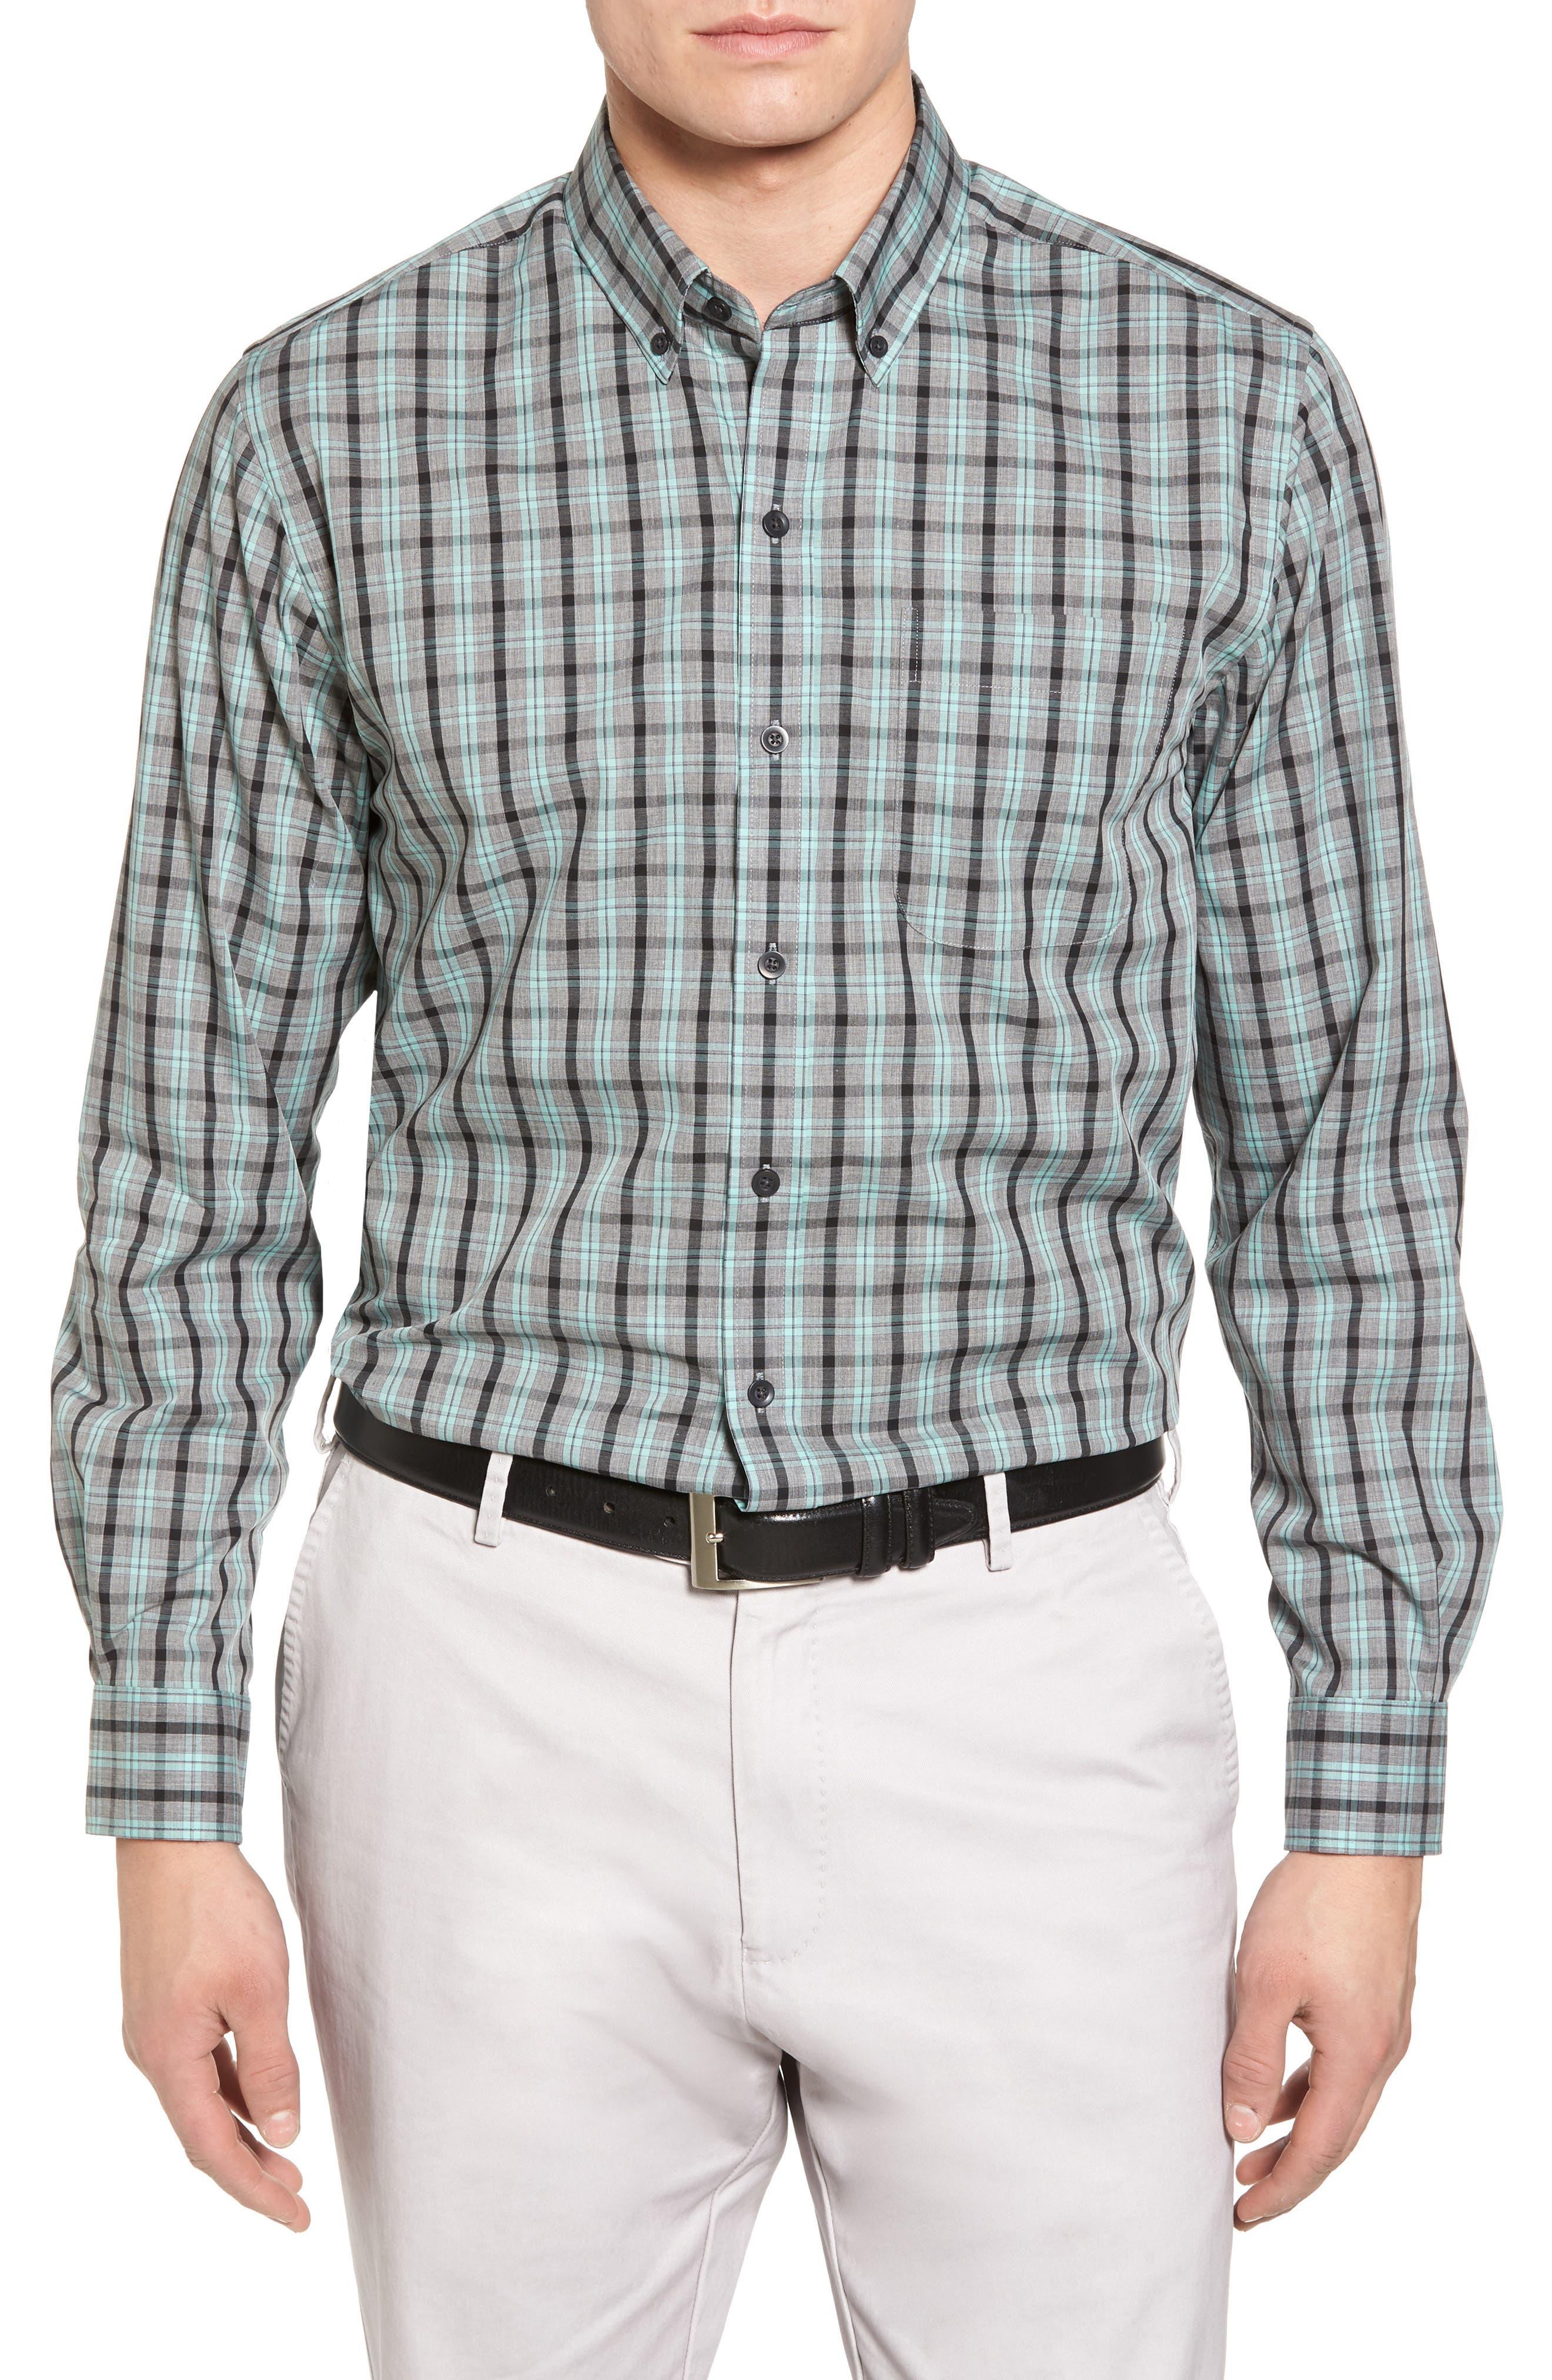 Davis Non-Iron Plaid Sport Shirt,                             Main thumbnail 1, color,                             300